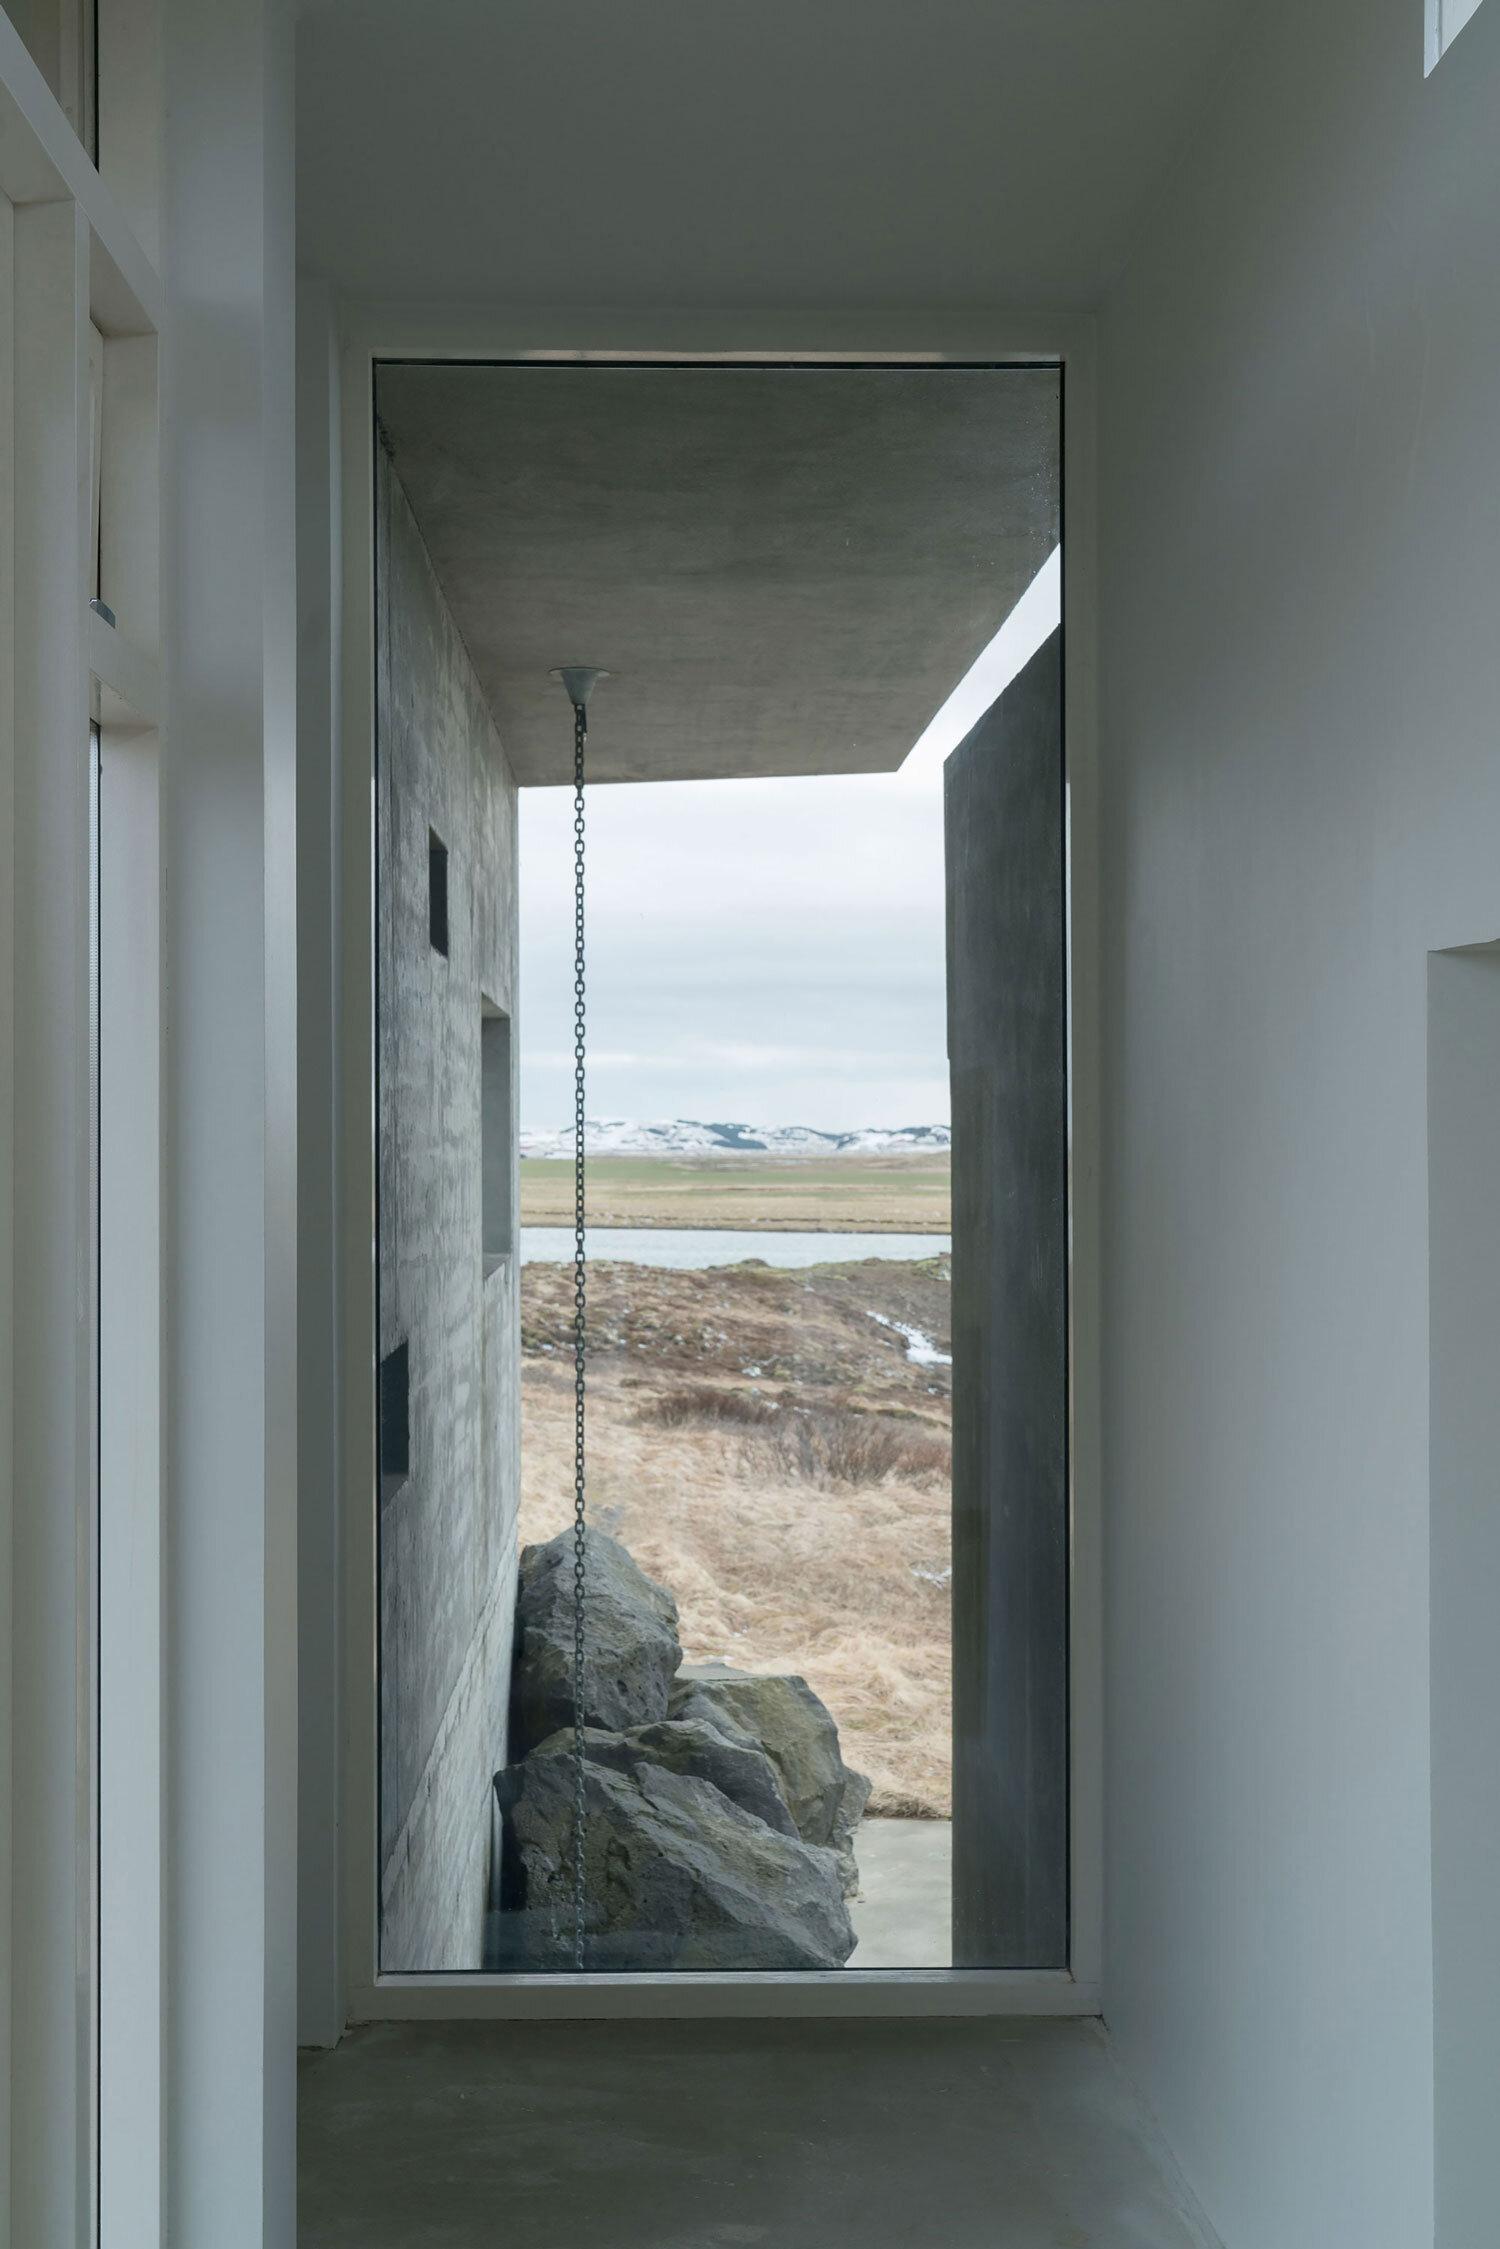 Langitangi Country House-Krads-Visual Atelier 8-Architecture-10.jpg